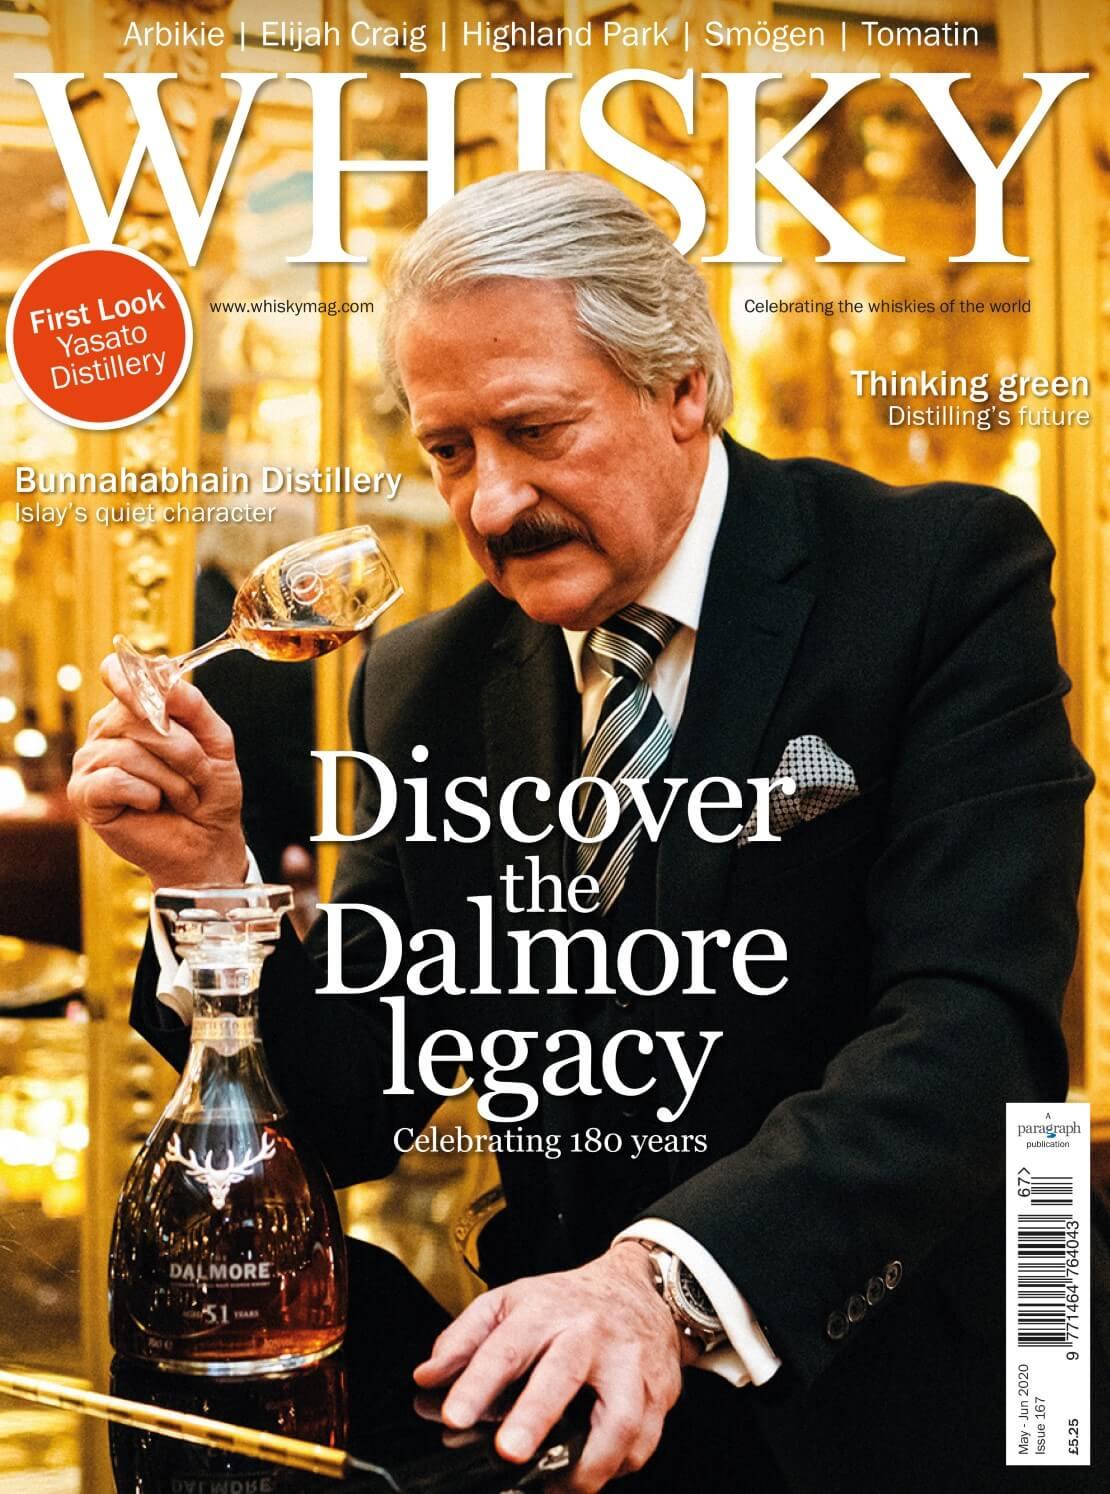 Dalmore 180th Anniversary, Green Whisky, Bunnahabhain, Yasato Distillery